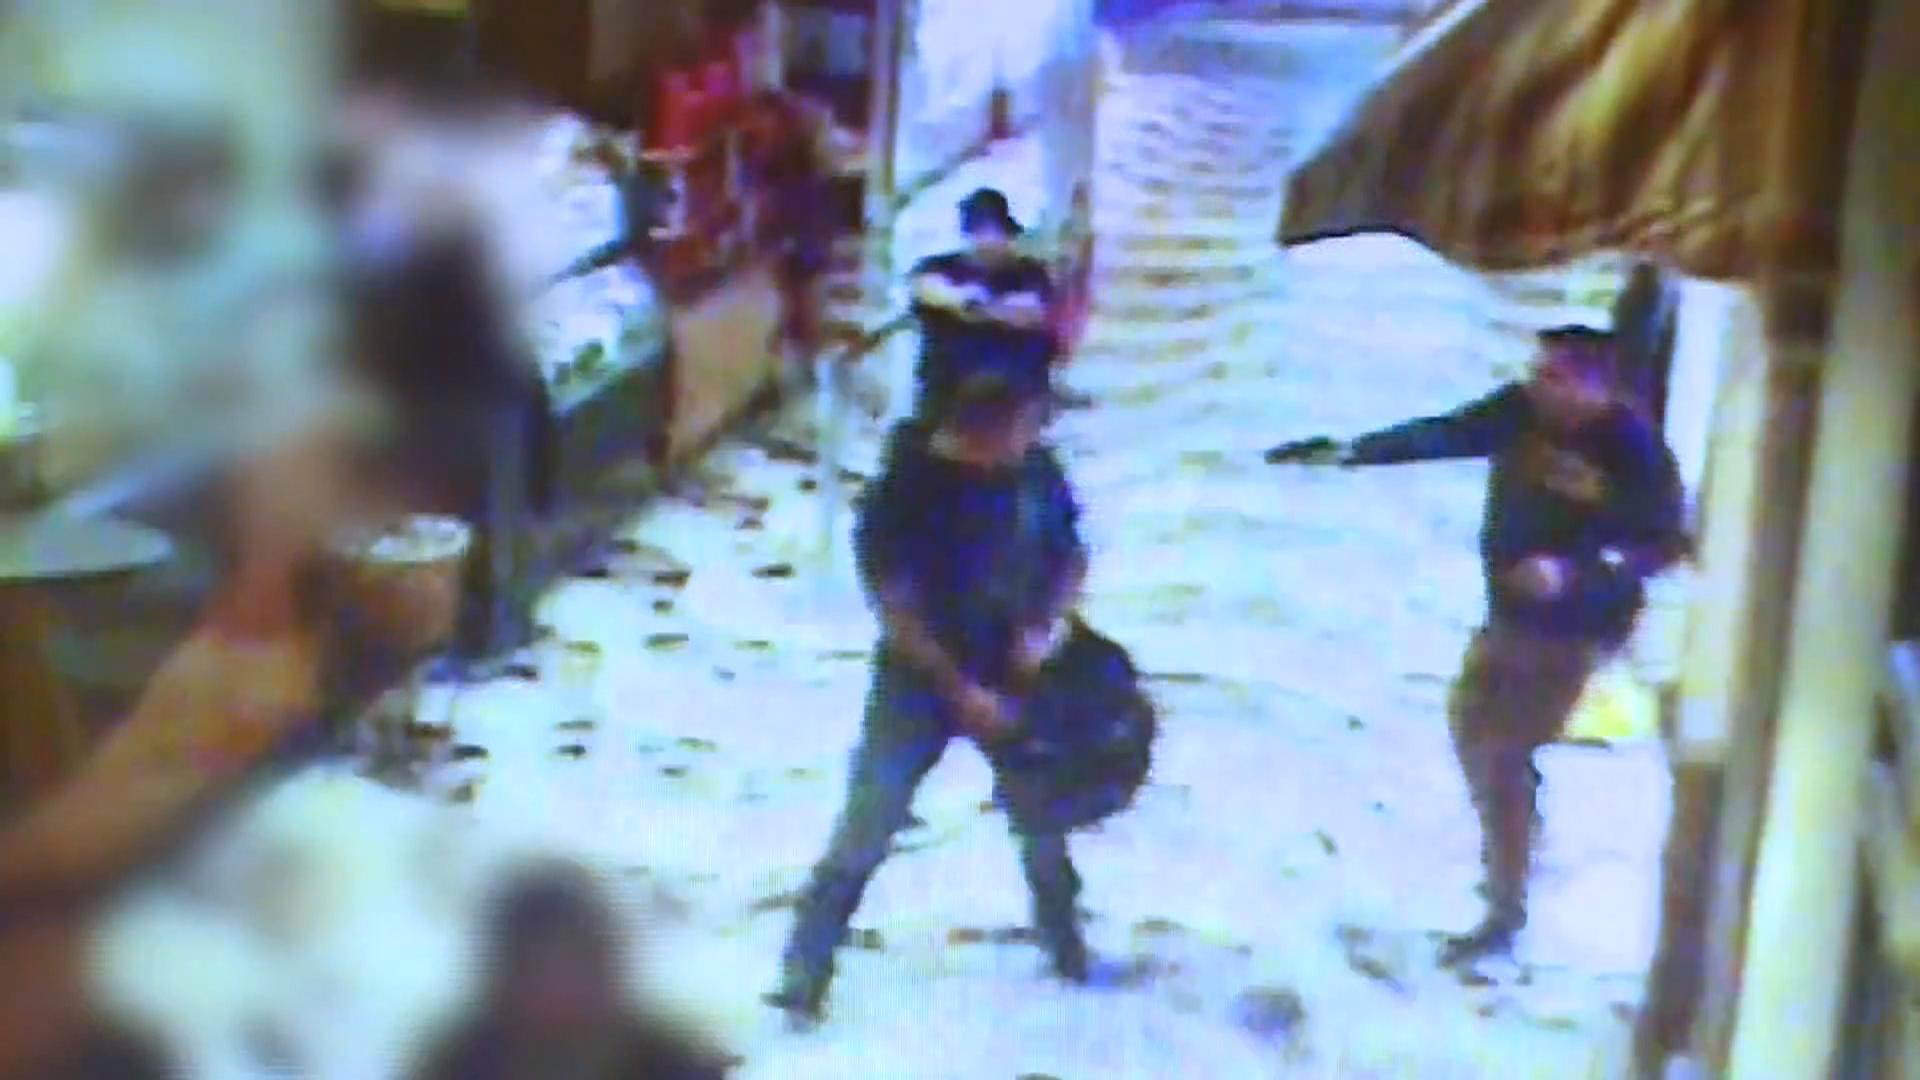 las vegas police release video of casino shooting nbc news. Black Bedroom Furniture Sets. Home Design Ideas